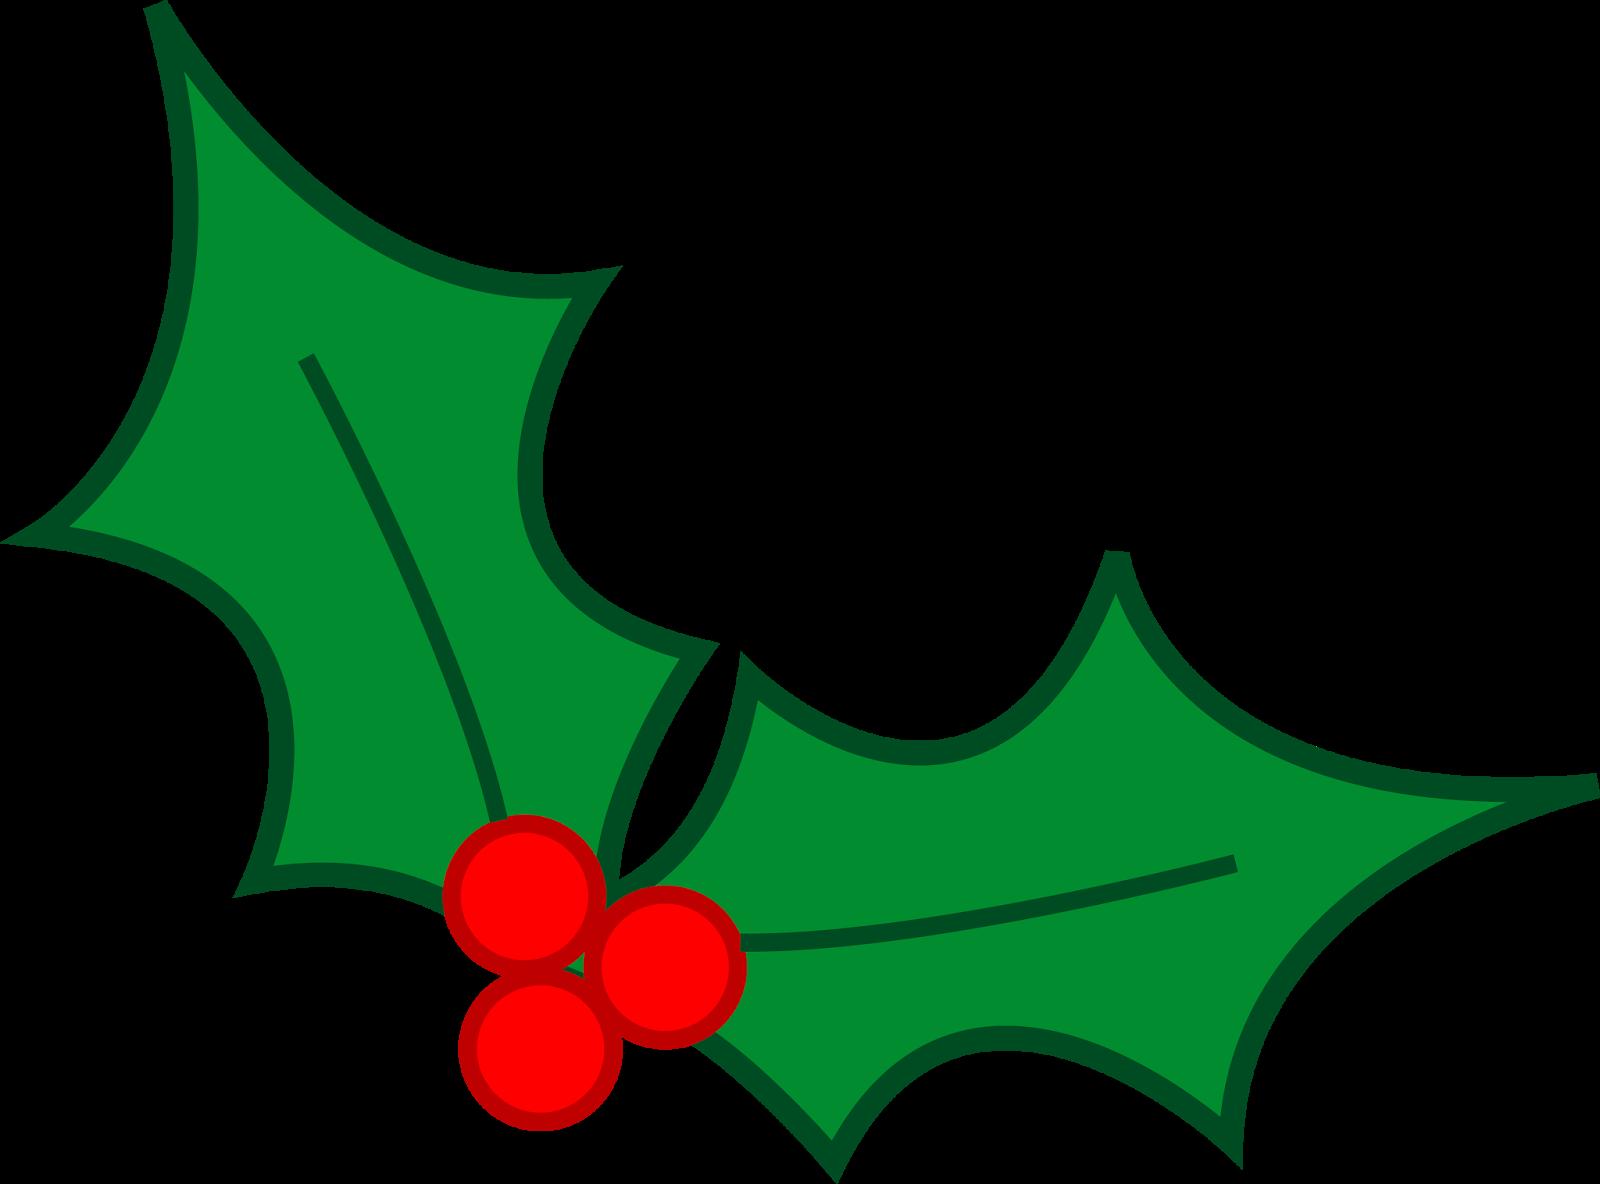 Christmas Tree Google Clip Art Animation-Christmas Tree Google Clip Art Animations School Clipart-12